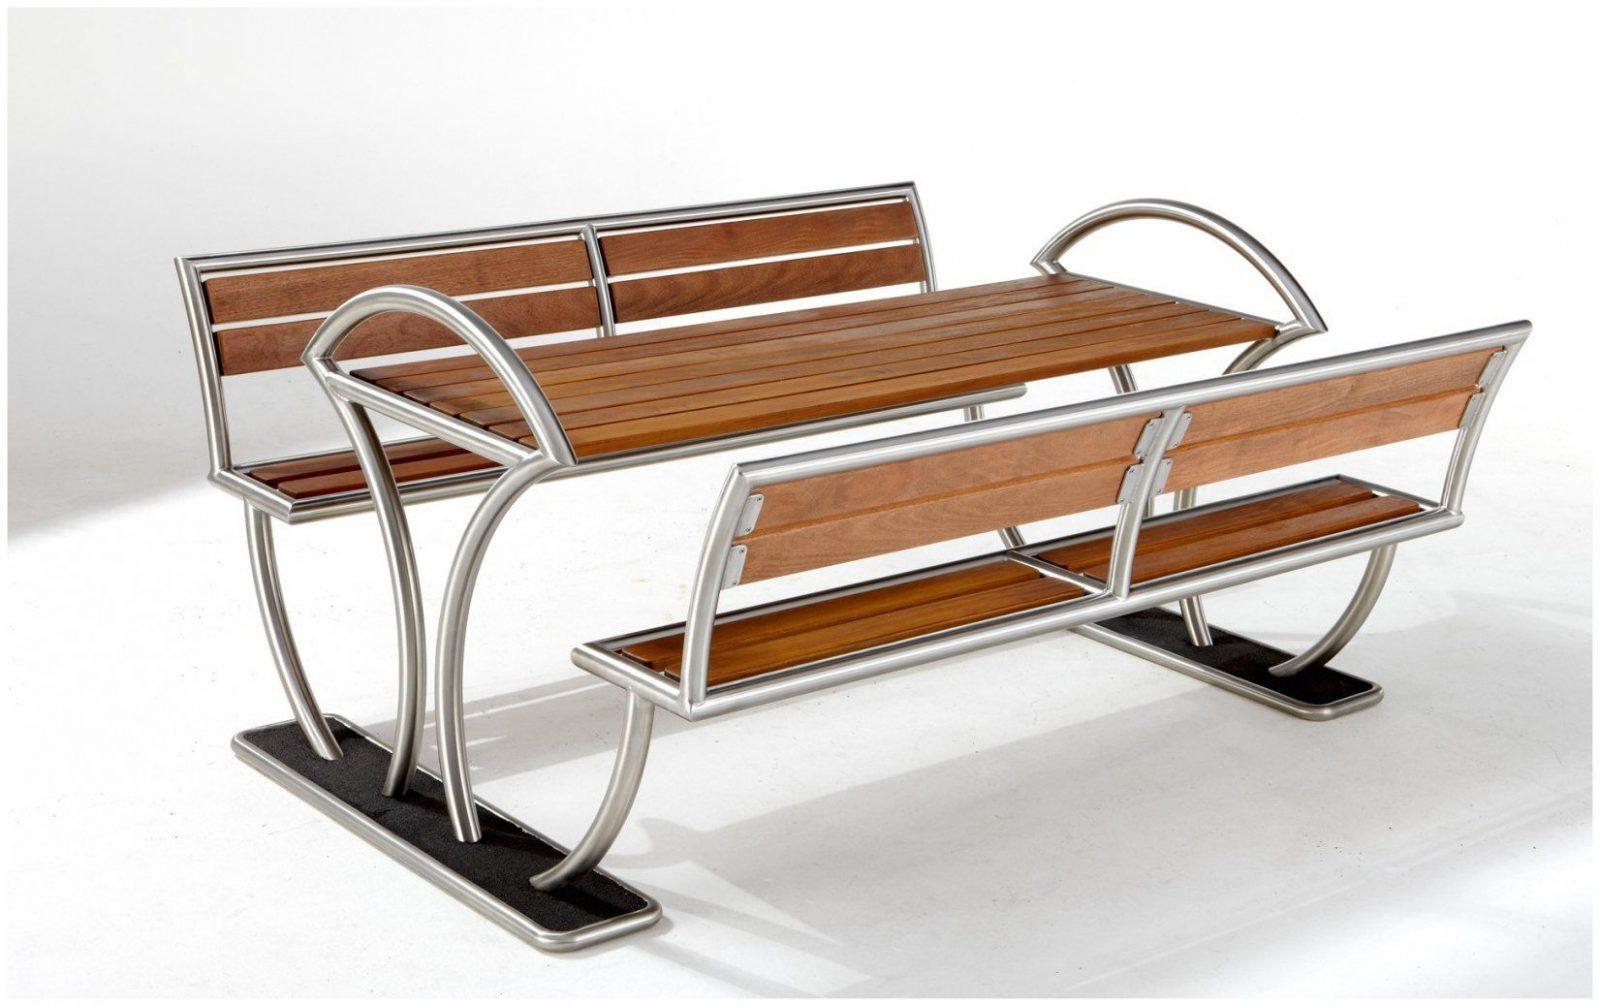 "Bank Tisch Kombination 85978 Tisch Bank Kombination ""tabula"" von Bank Tisch Kombination Holz Bild"